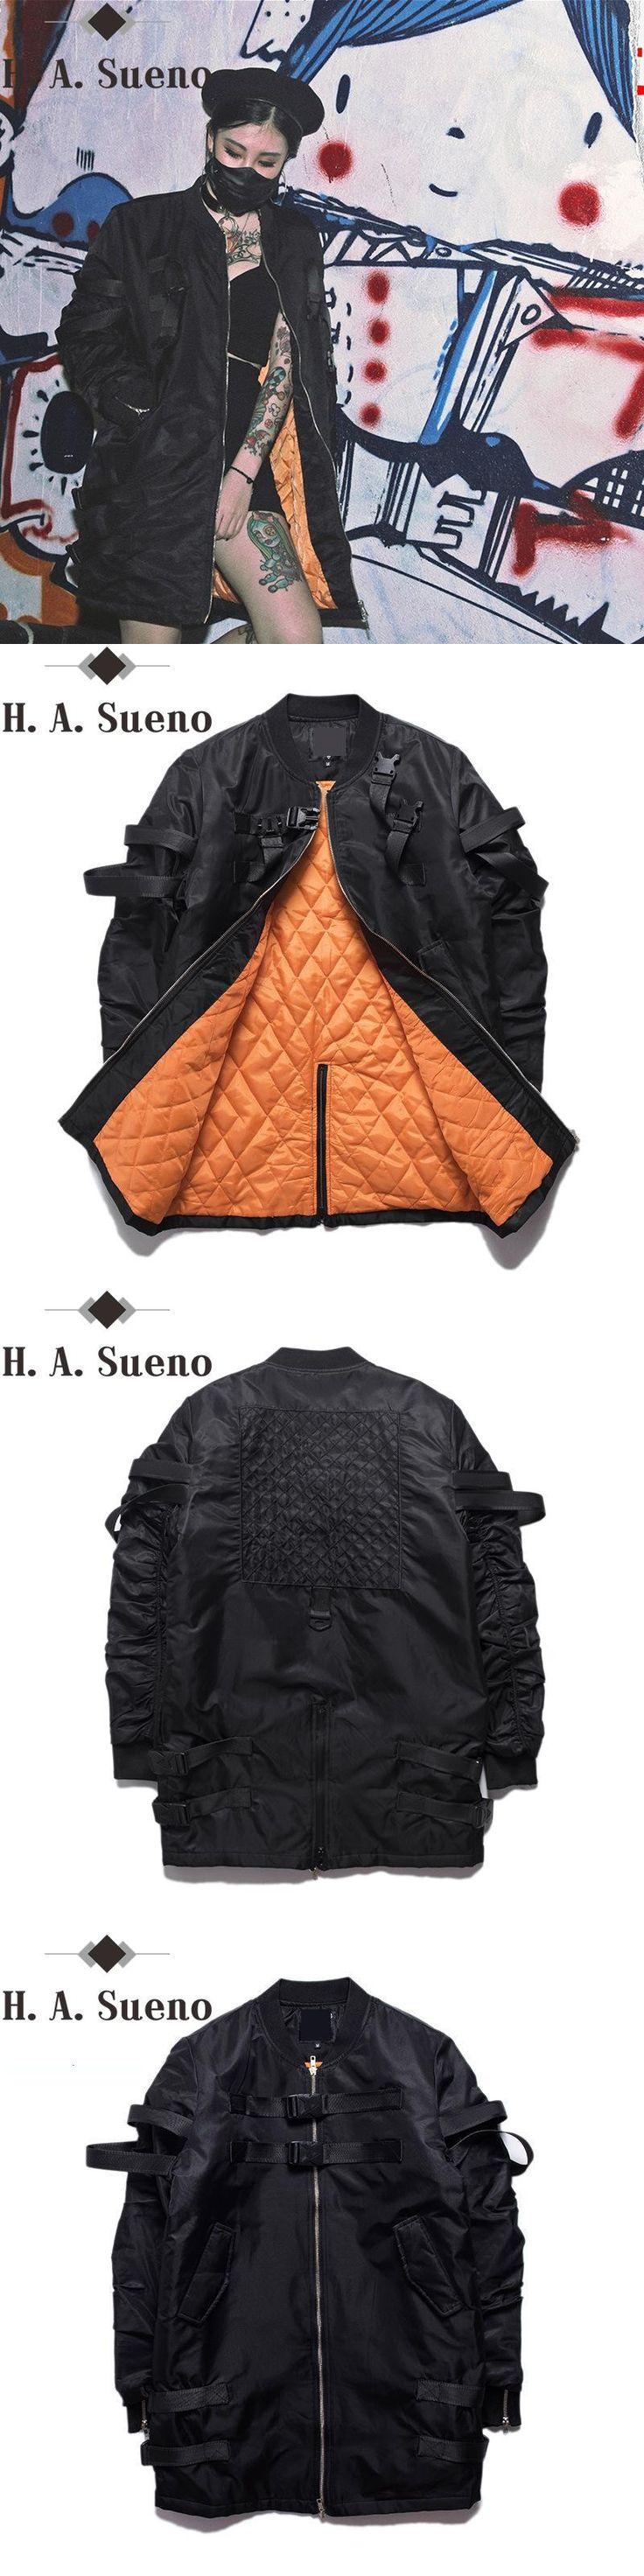 Fashion warm parkas Jacket Men punk black streetwear hip hop Mens long Bomber Jackets Mens Parka's Winter jackets and Coats